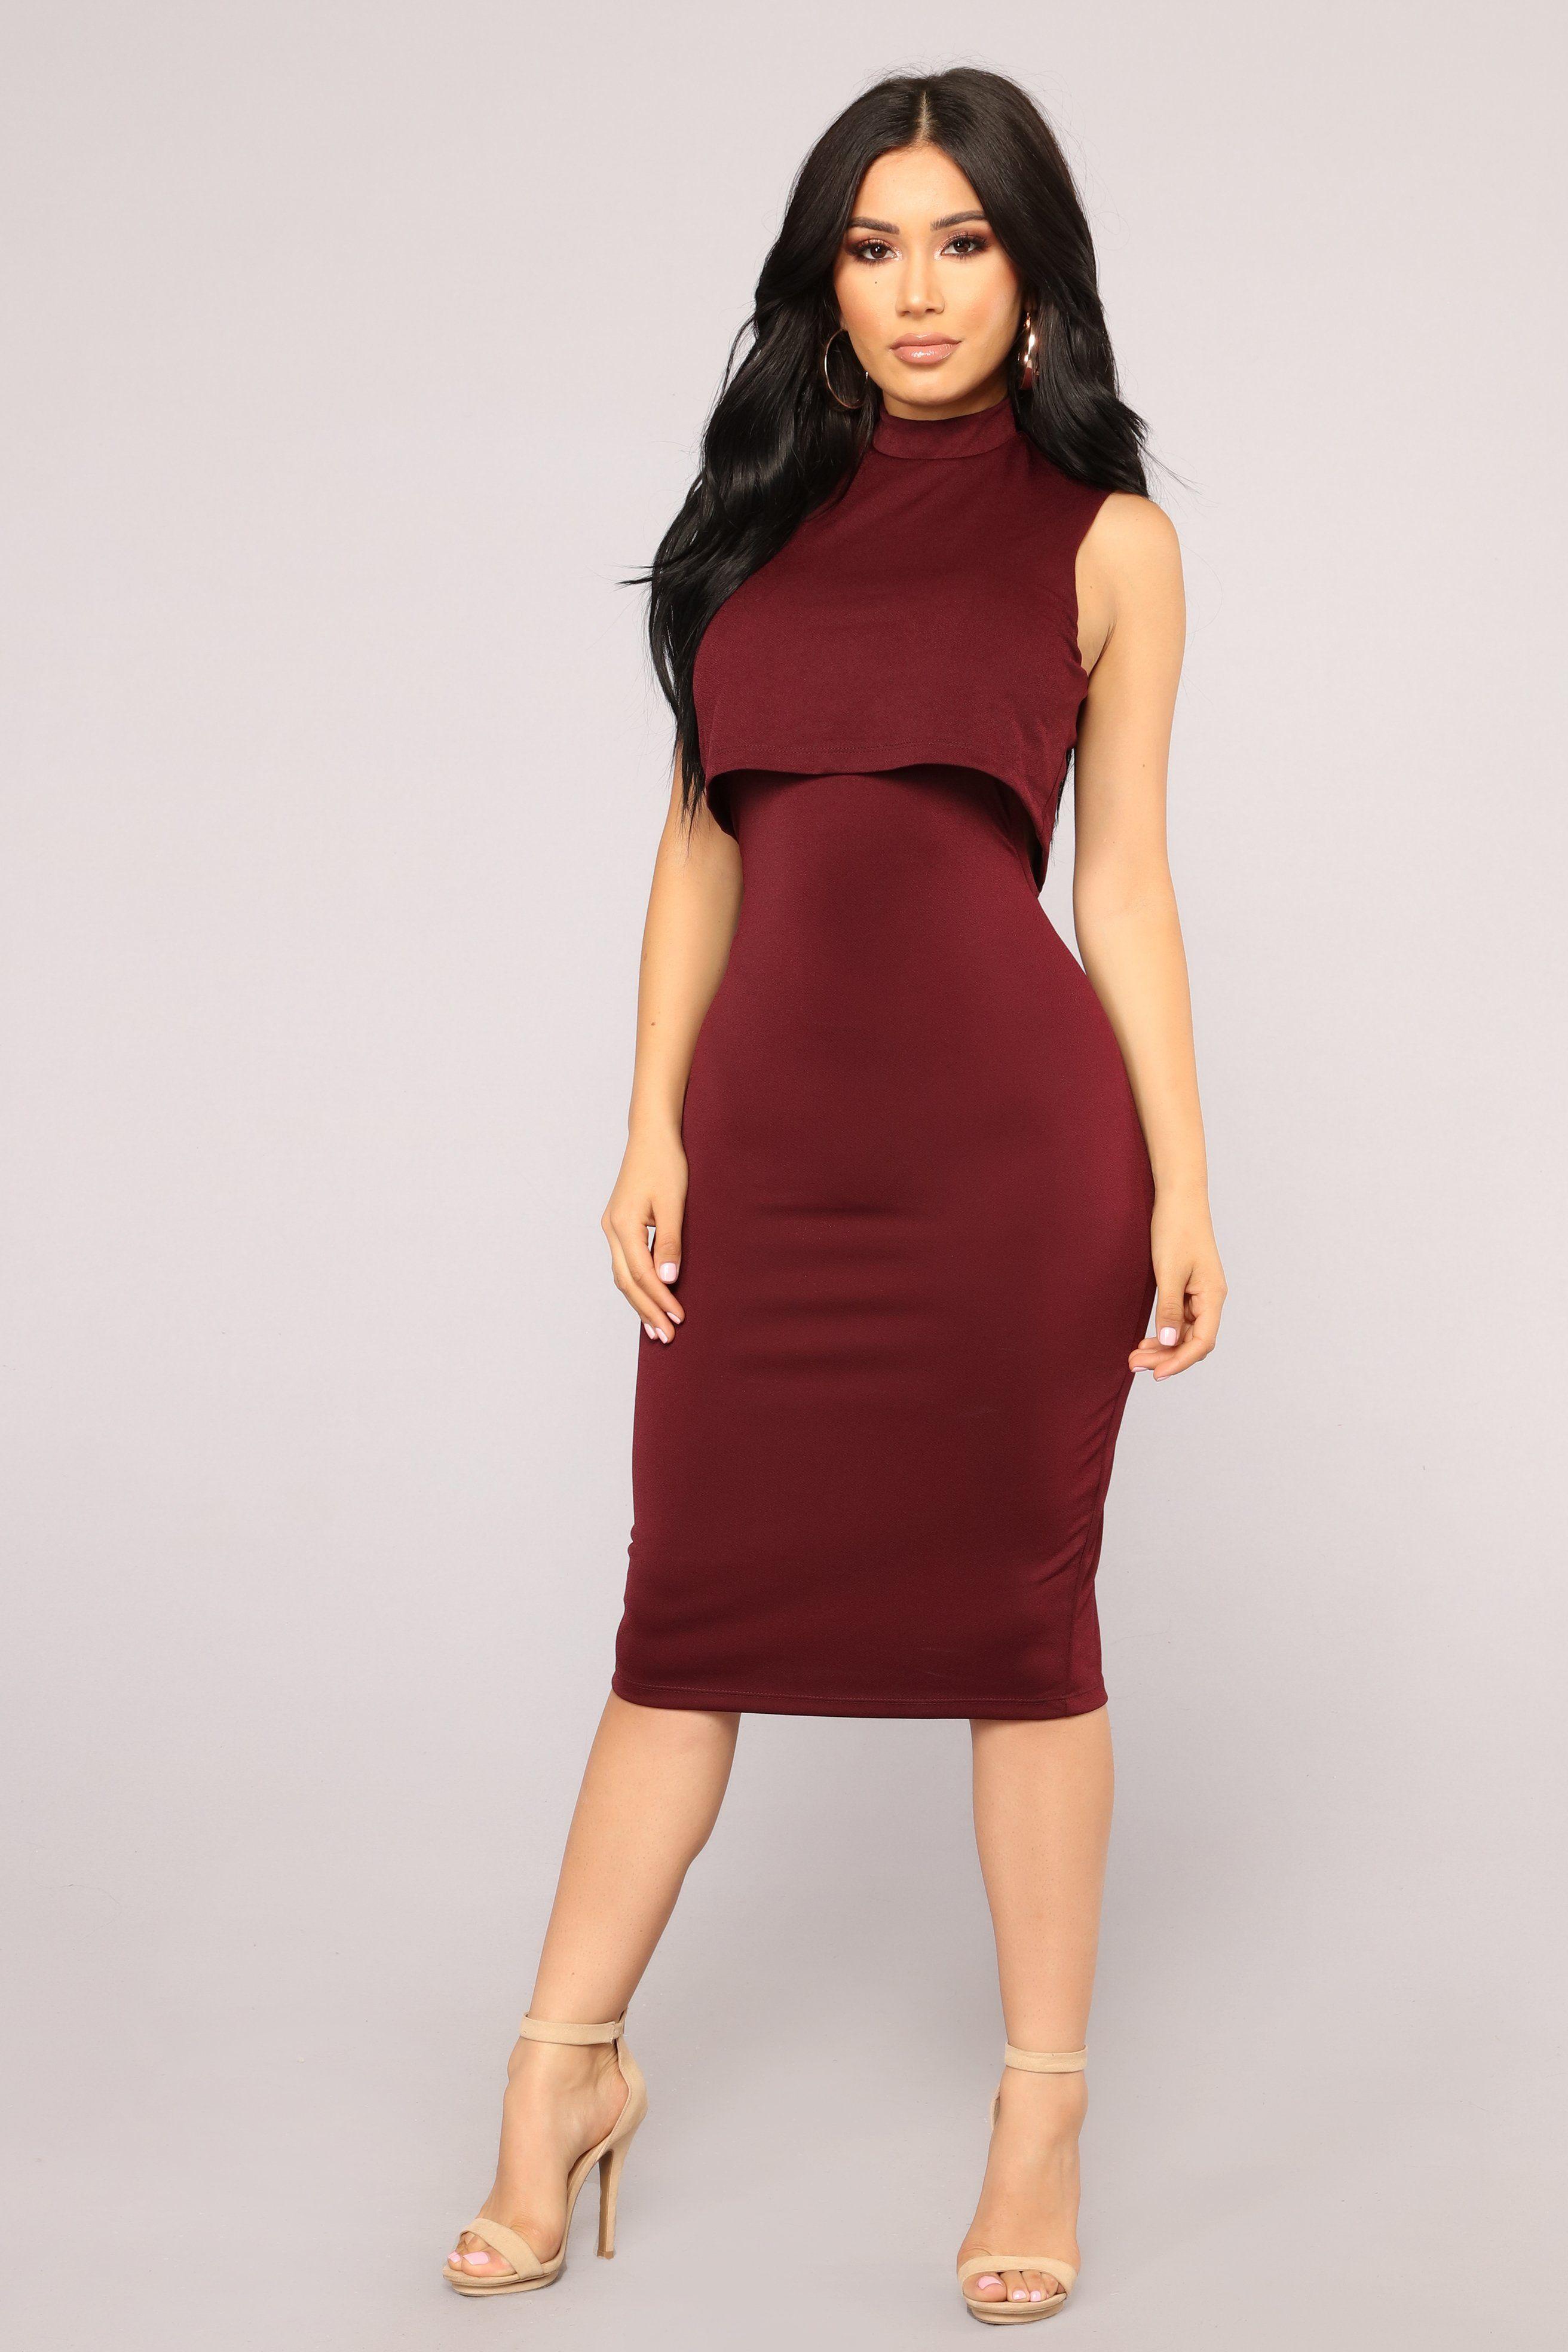 How to tight wear midi dress fotos